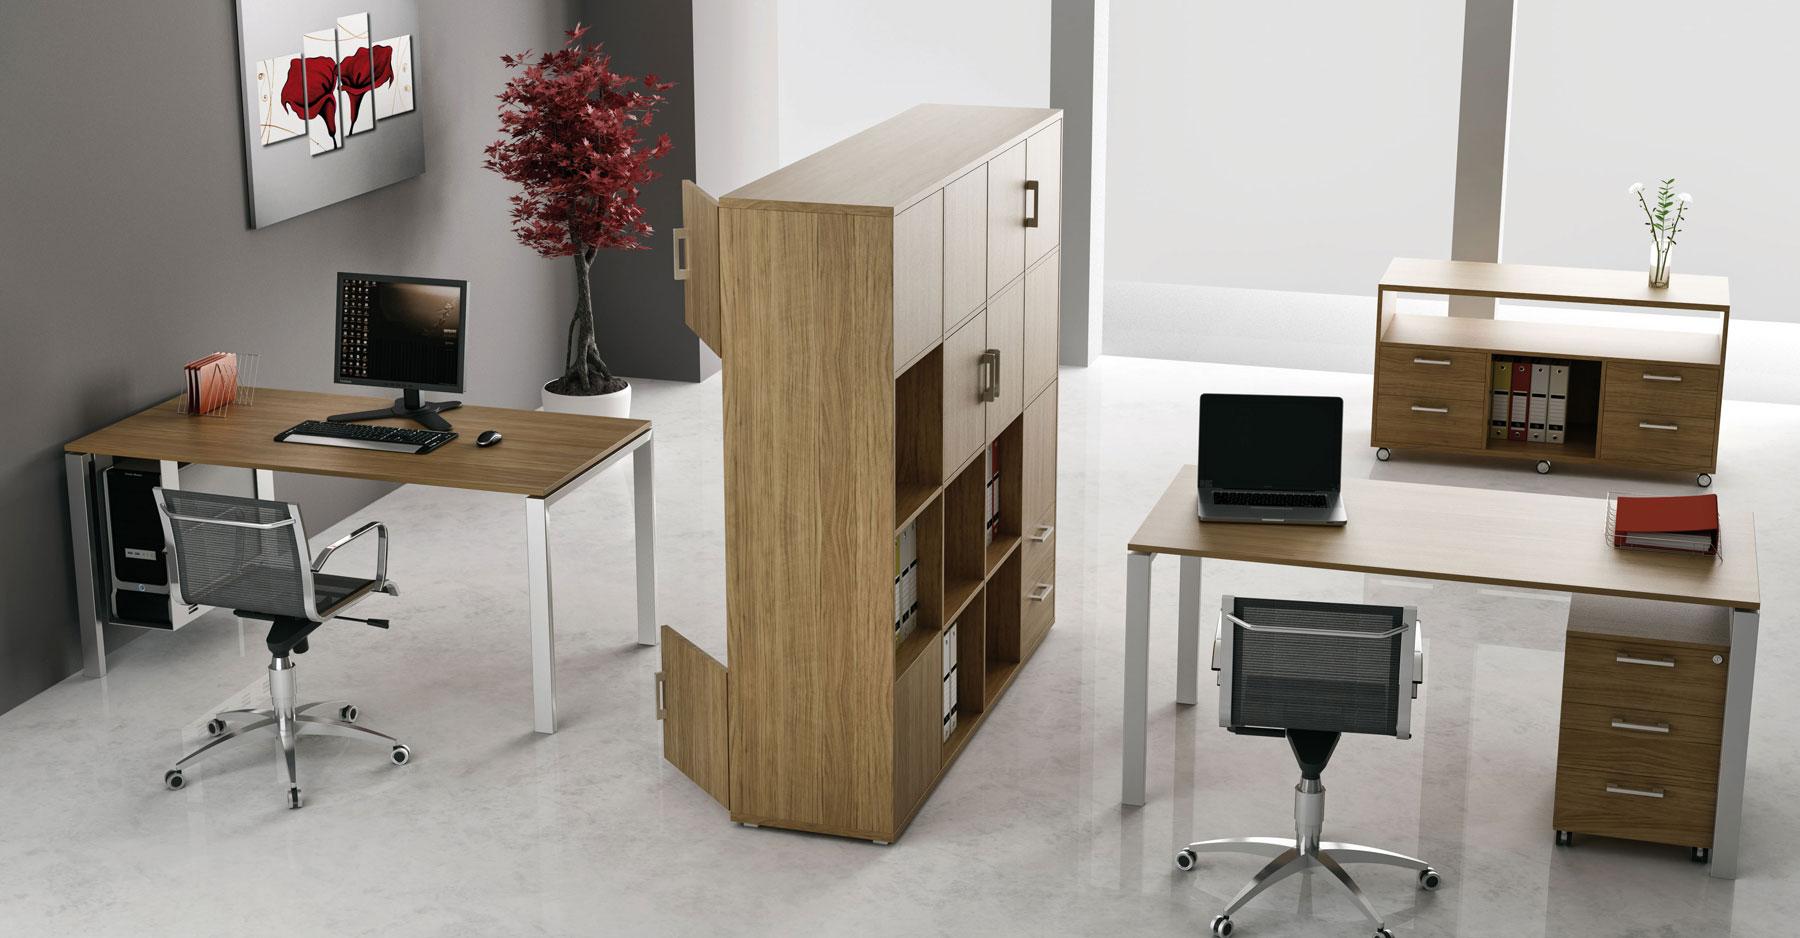 Eismobili due contract e mobili da uffici made in italy for Mobili made